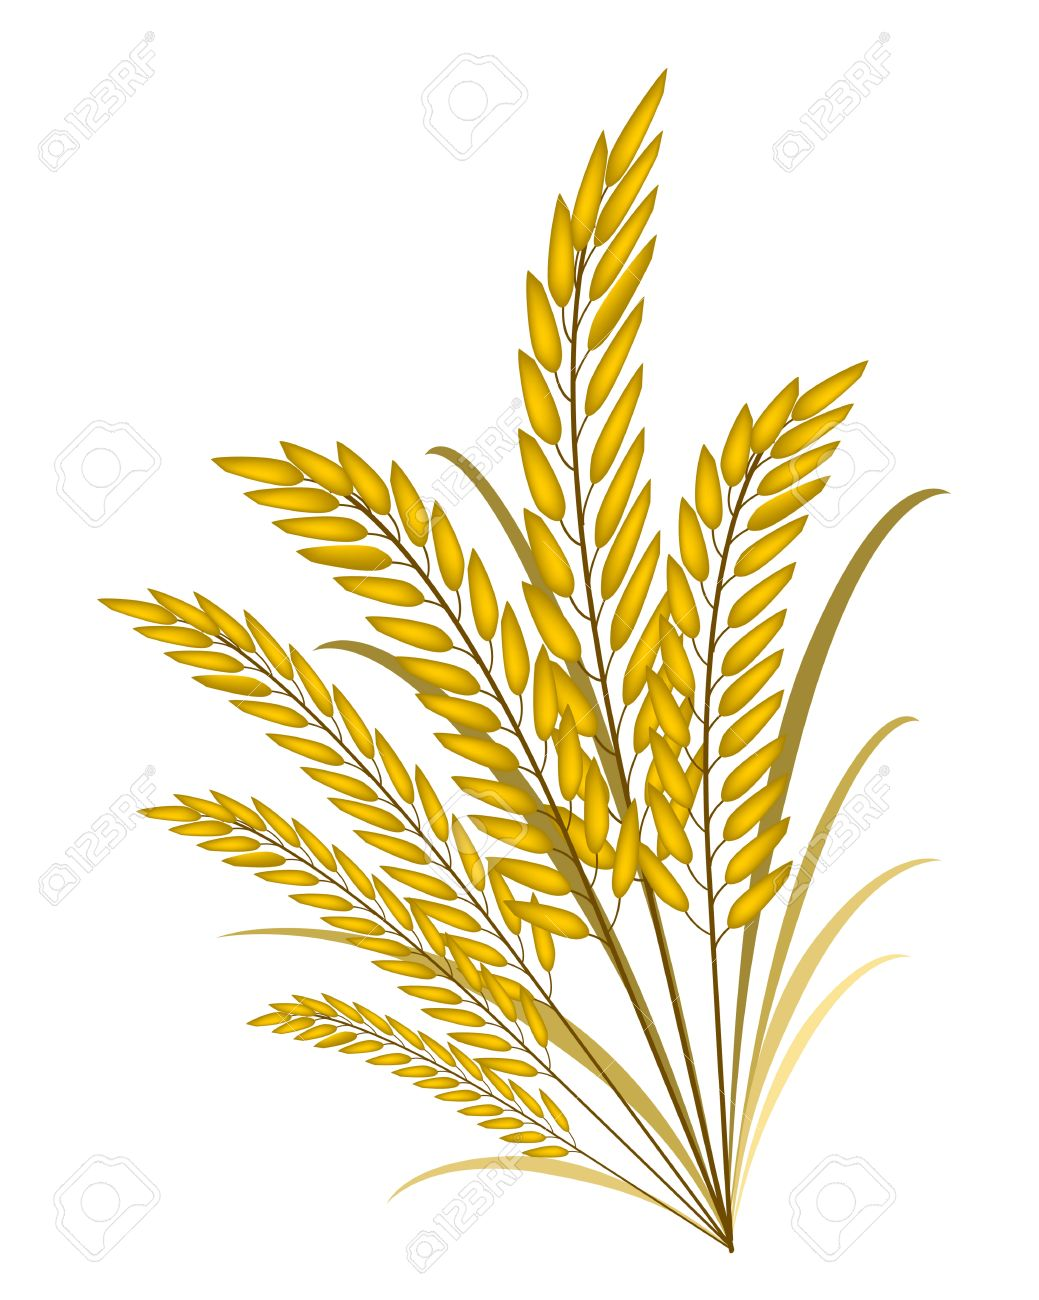 1039x1300 Rice Crop Clipart Amp Rice Crop Clip Art Images